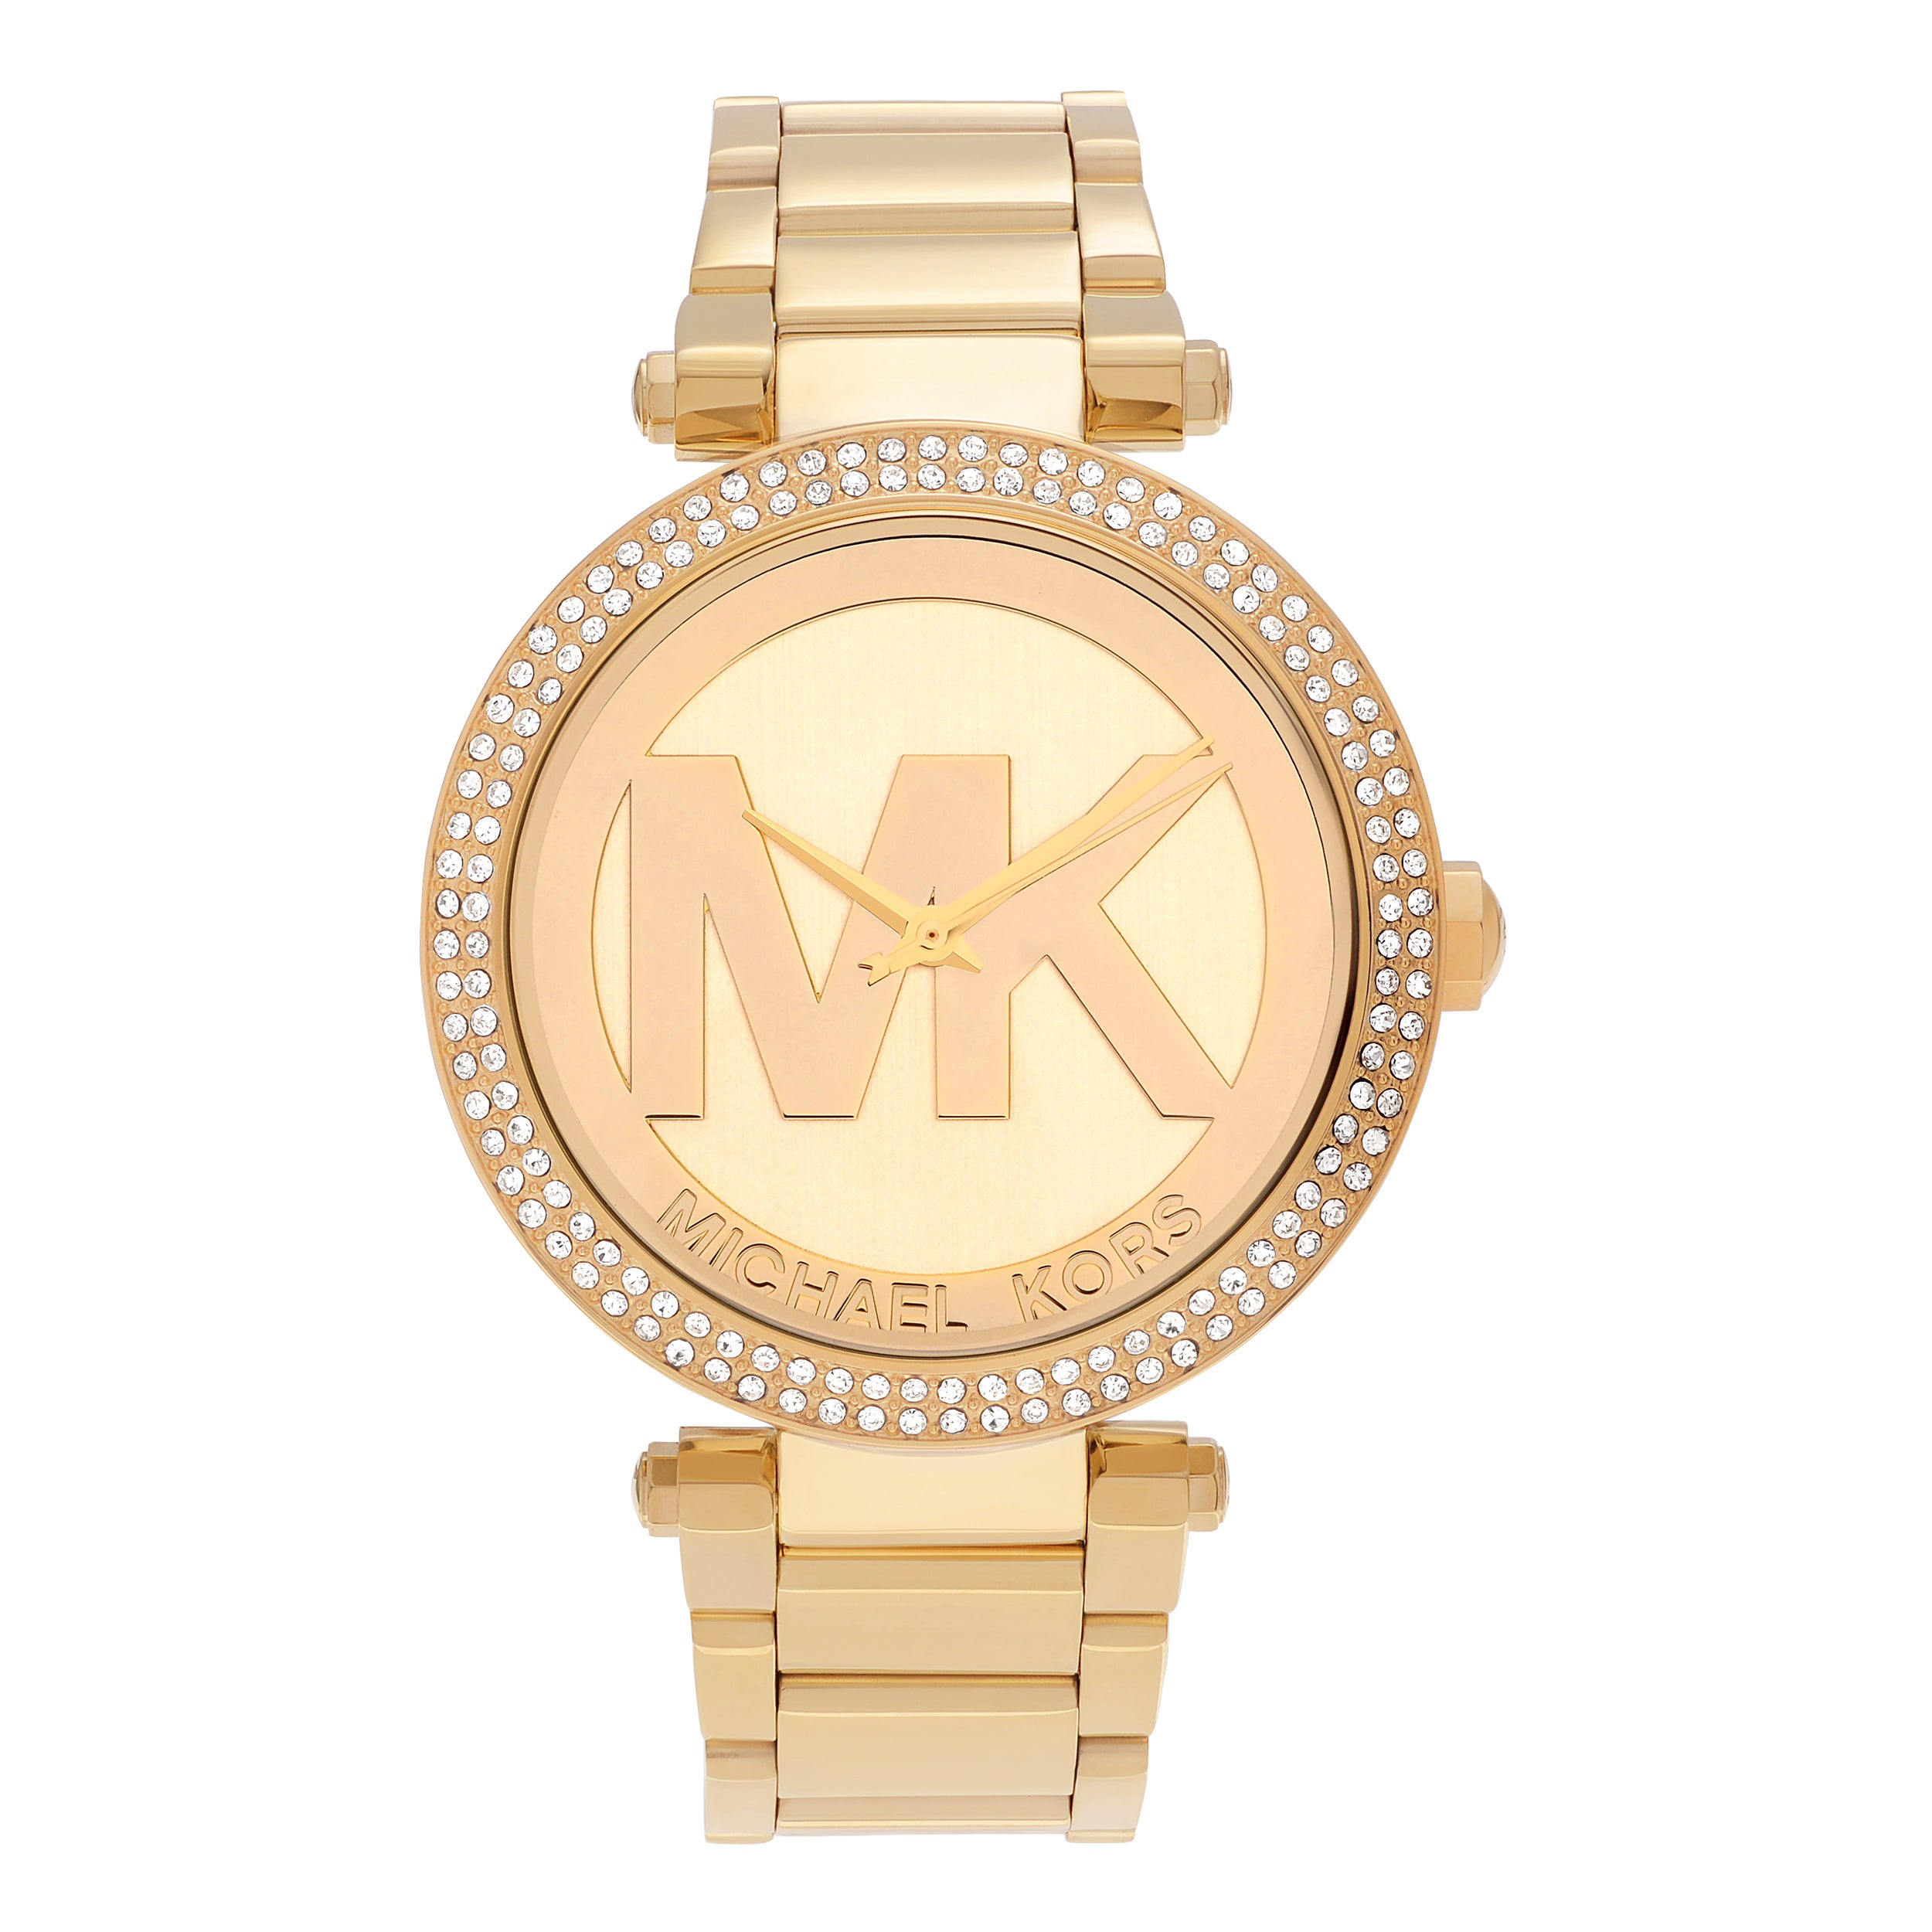 Michael Kors Women's MK5784 'Parker' Goldtone Stainless Steel Crystal Pave Logo Dial Link Bracelet Watch Gold